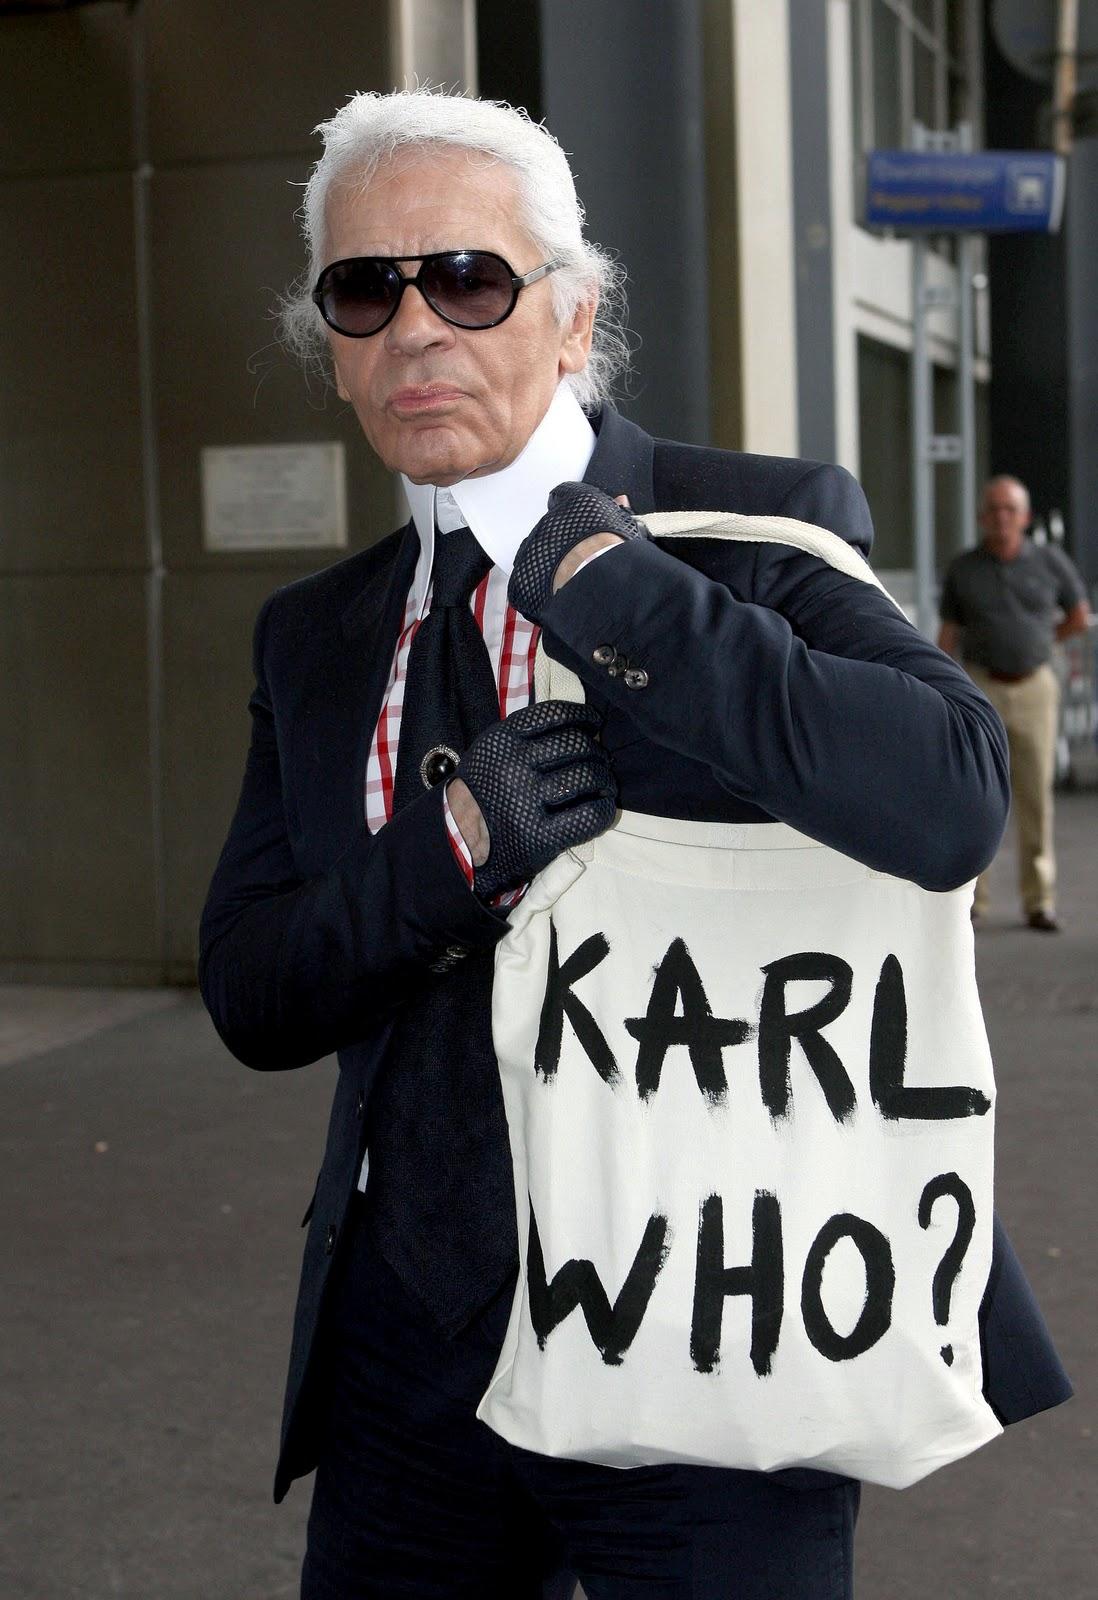 His name is karl kaiser karl lagerfeld affashionate com for Karl lagerfeld fotografo